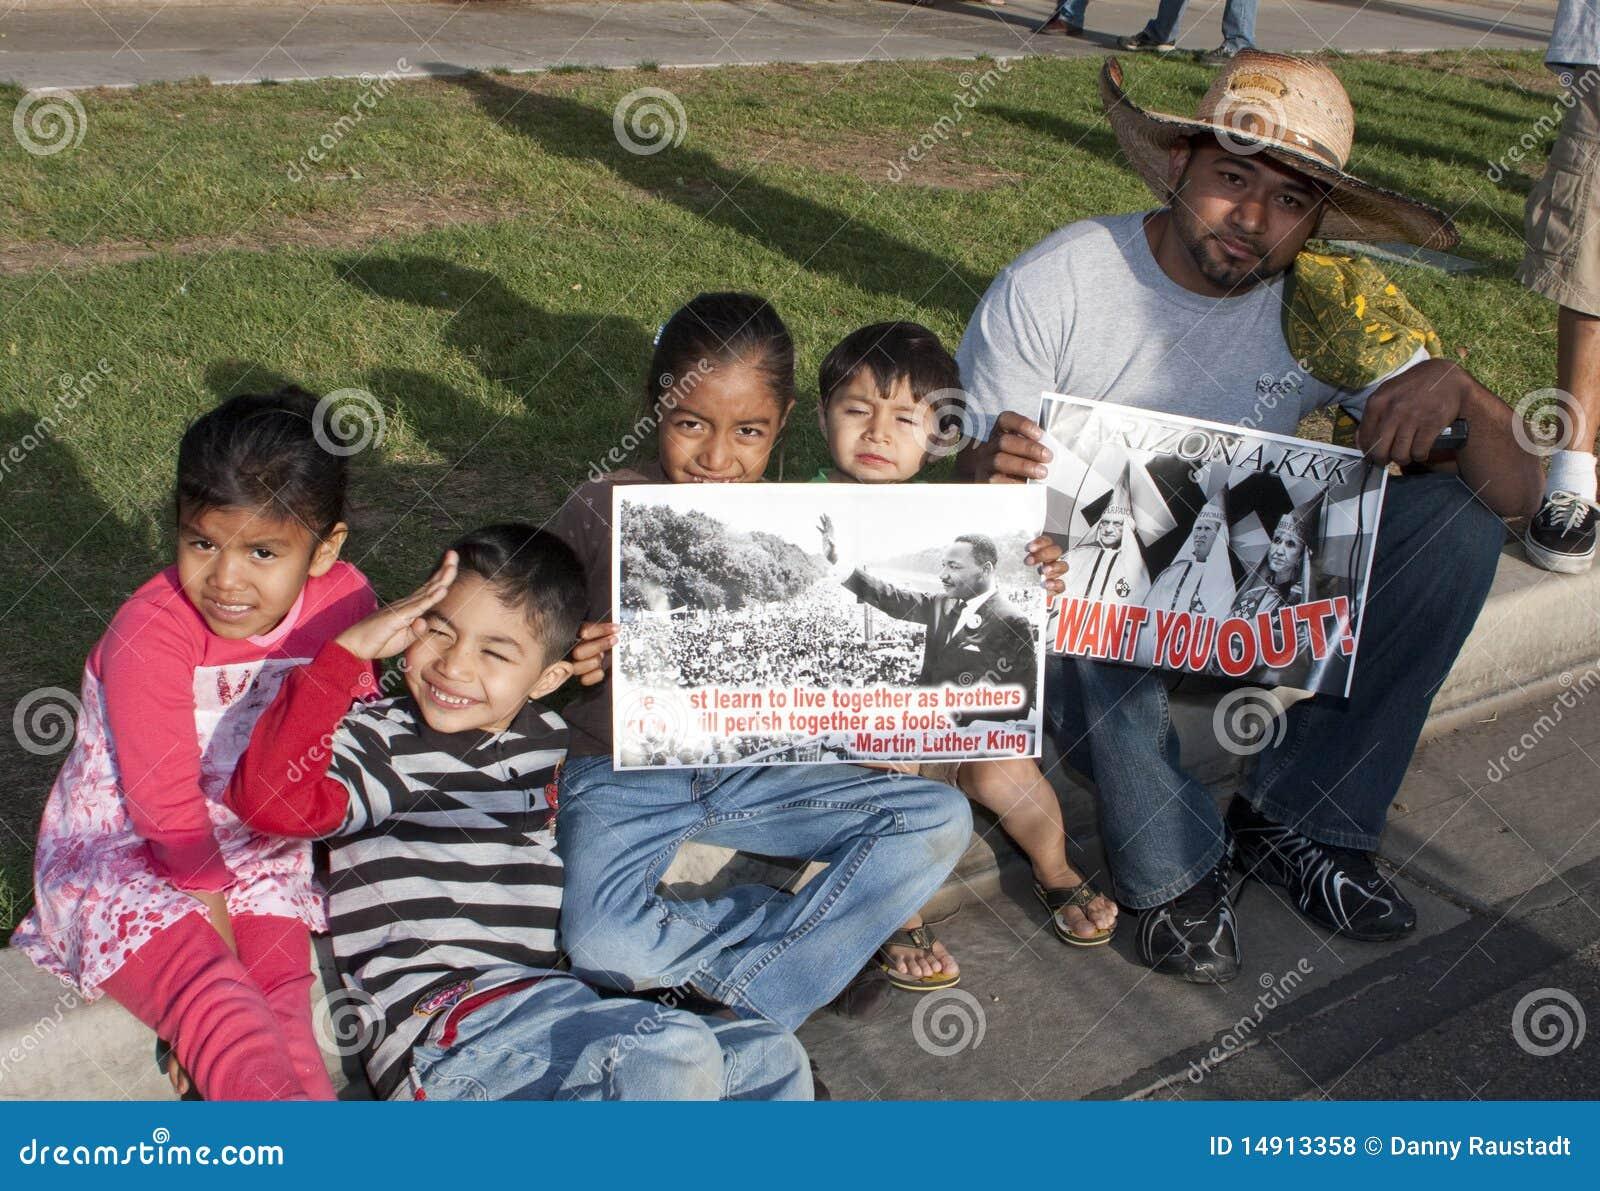 Protest Arizona Immigration Law SB 1070